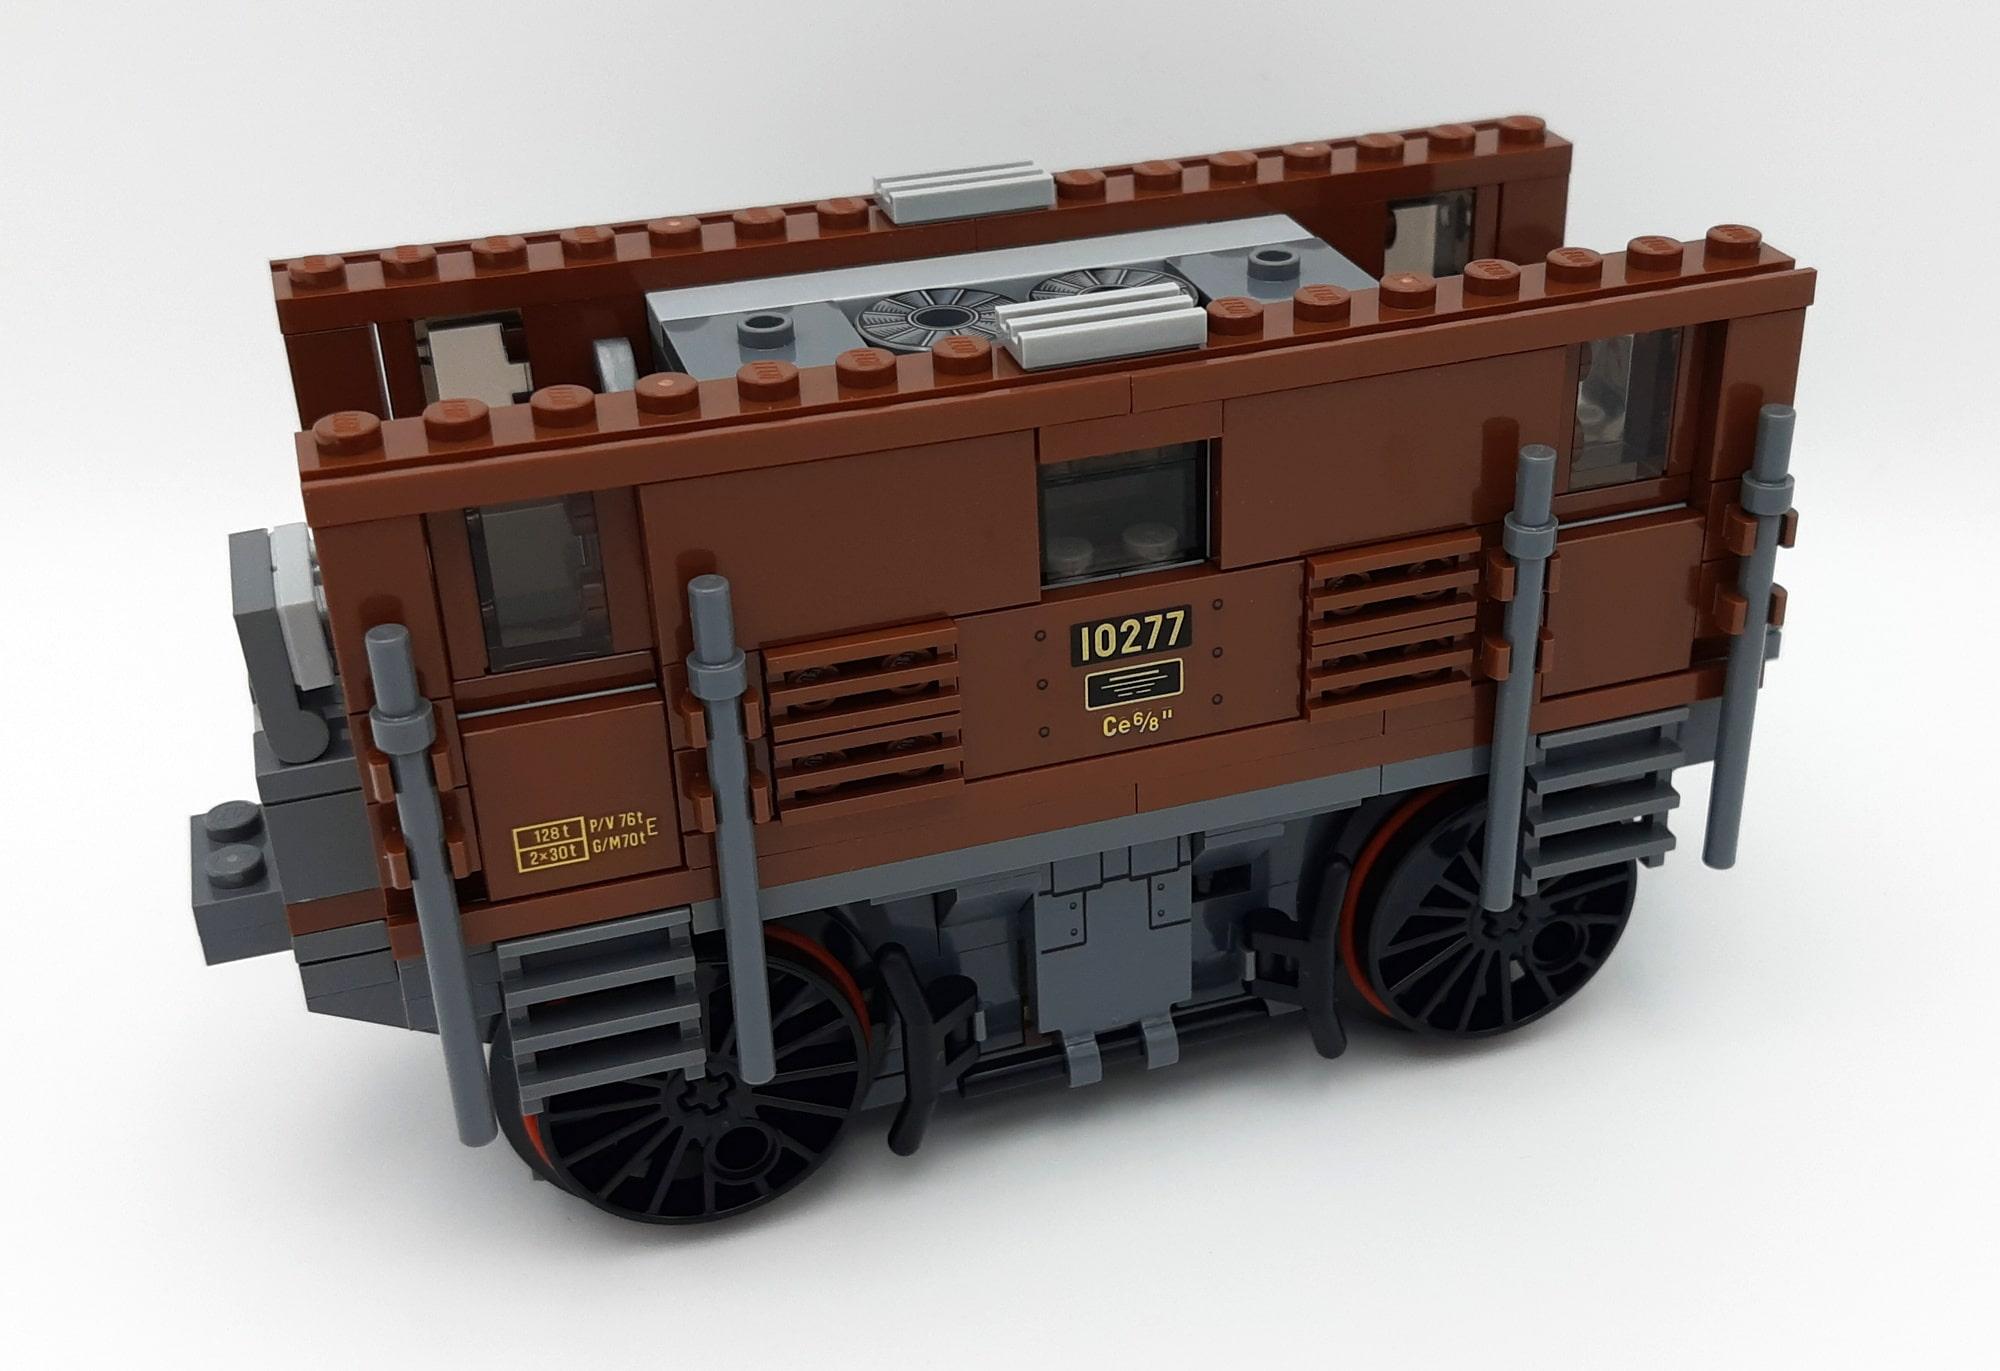 LEGO 10277 Krokodil Lokomotive - Bauabschnitt 2